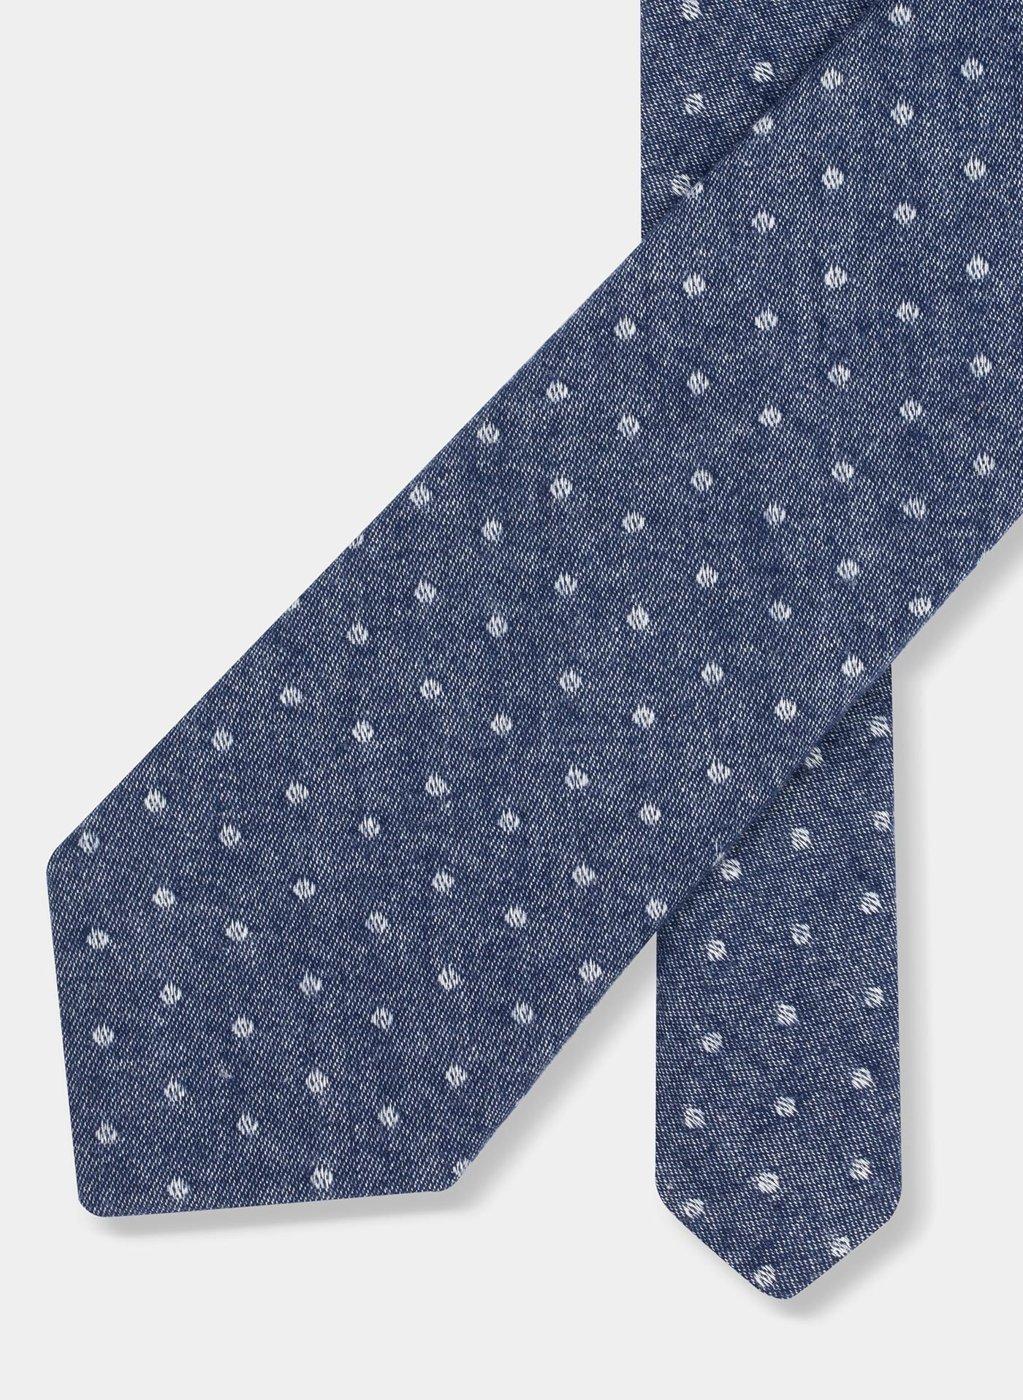 Krawat męski PLM-KX-749-S